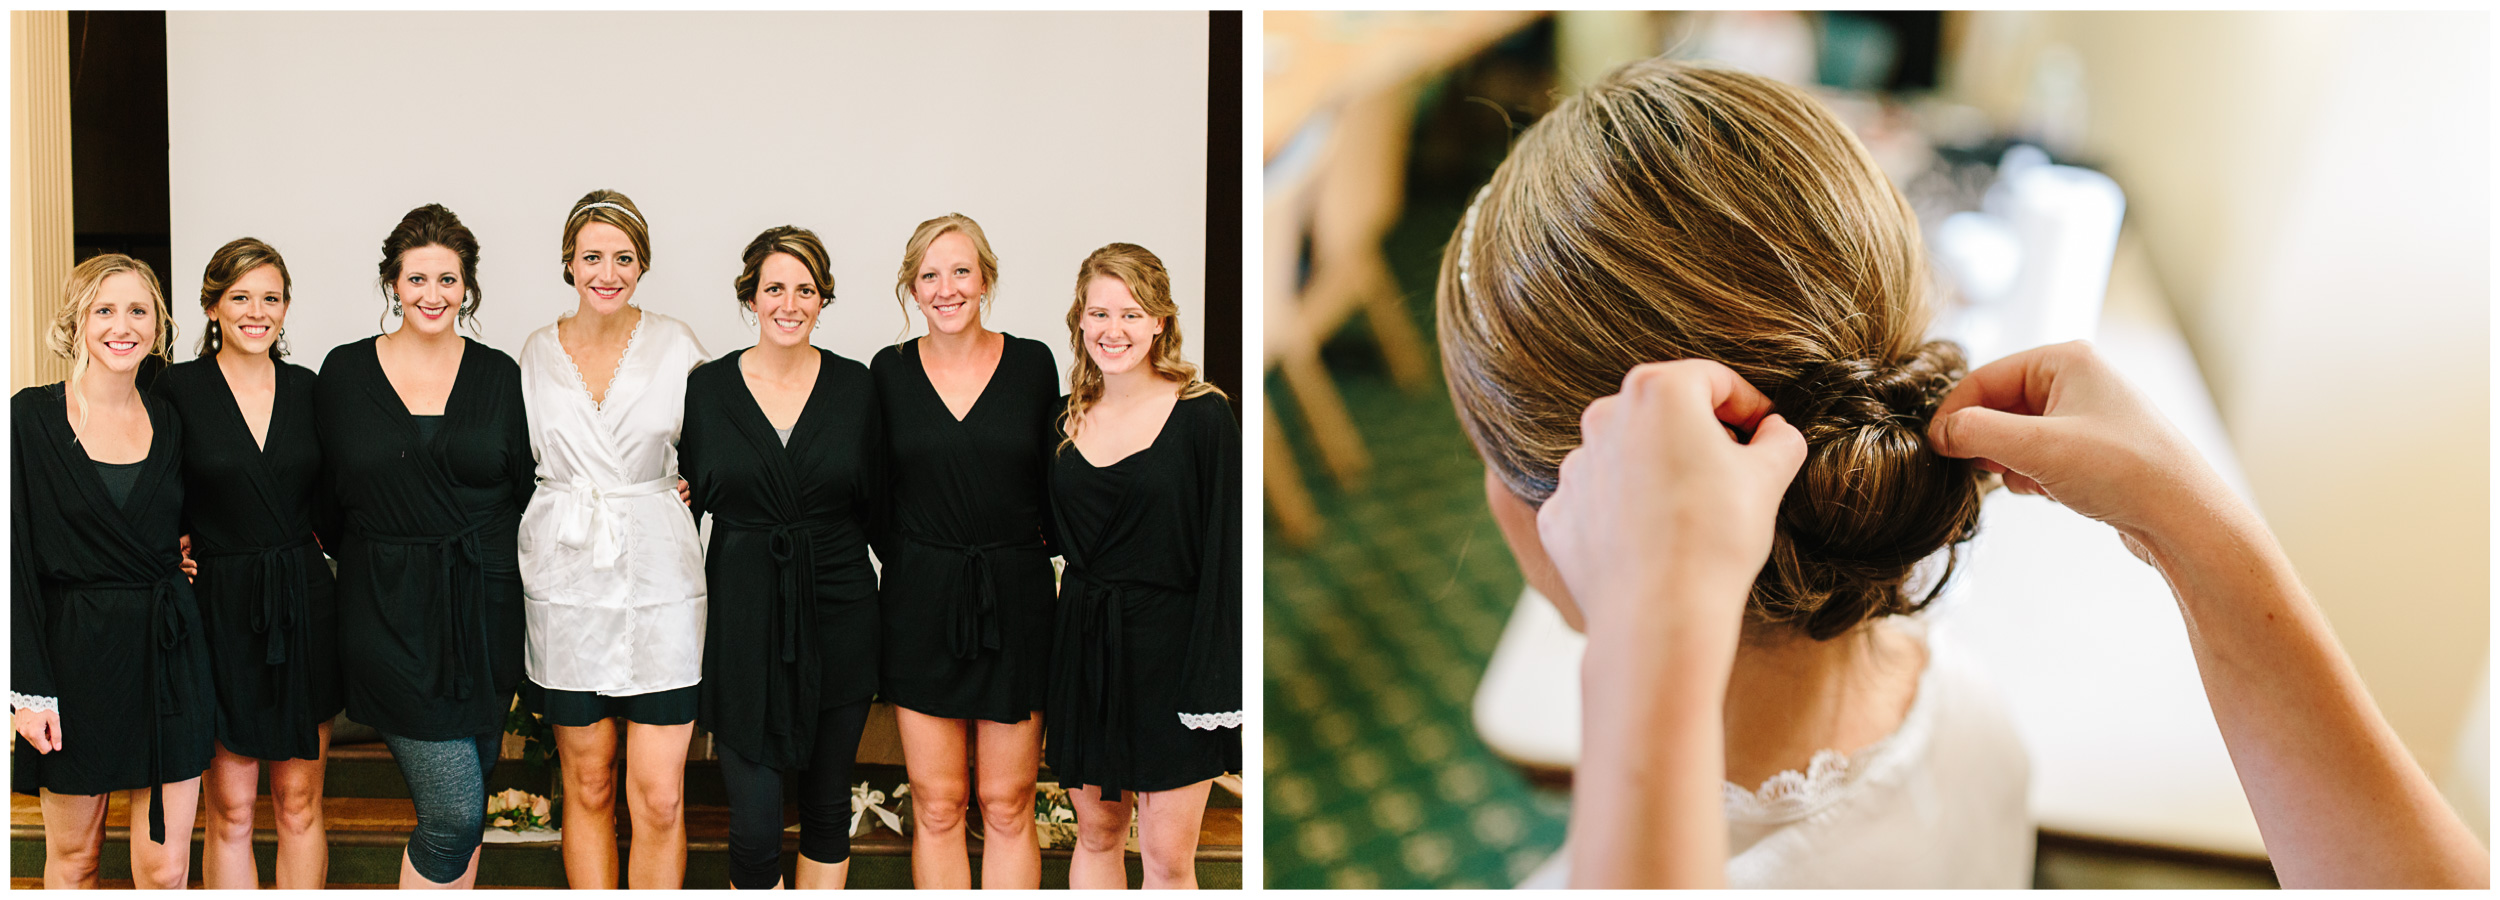 ann_arbor_michigan_wedding_6.jpg